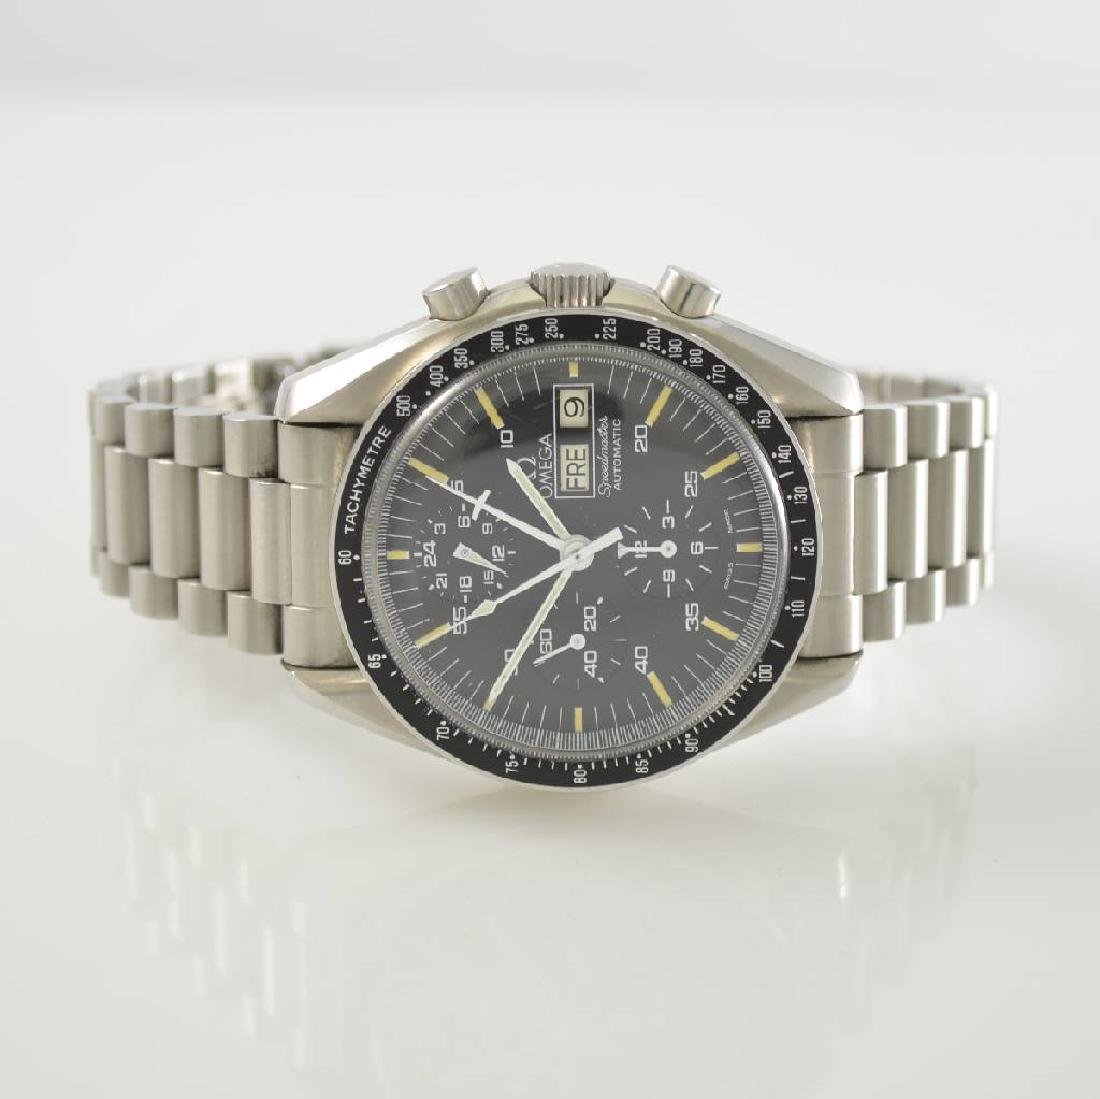 OMEGA extreme rare chronograph Speedmaster Holy Grail